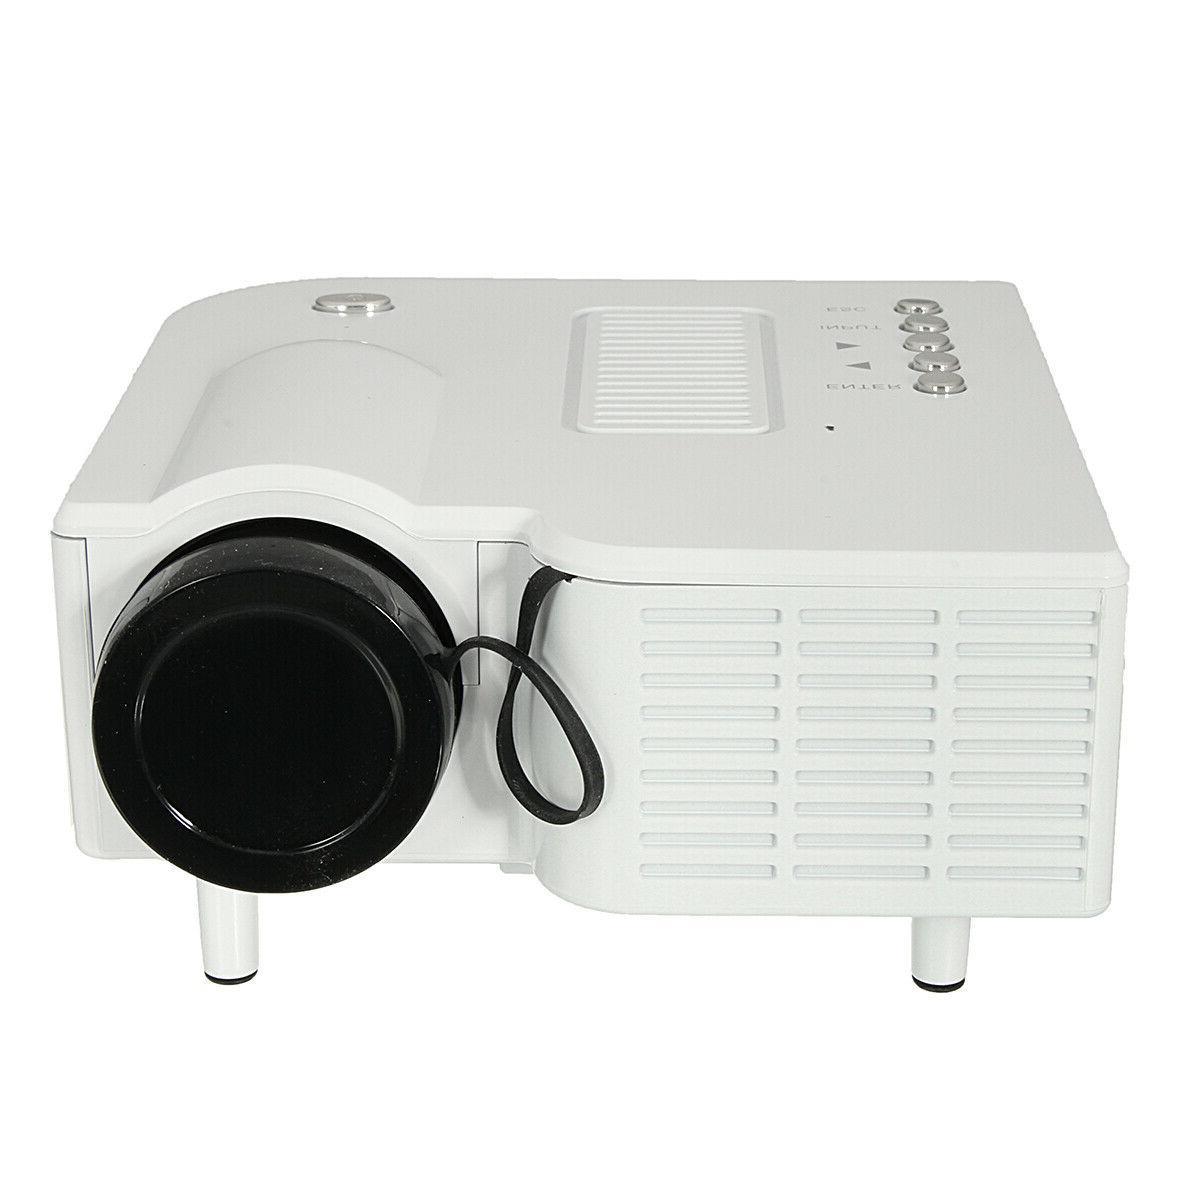 Full HD Theater LED Mini Multimedia Projector Cinema USB HDMI